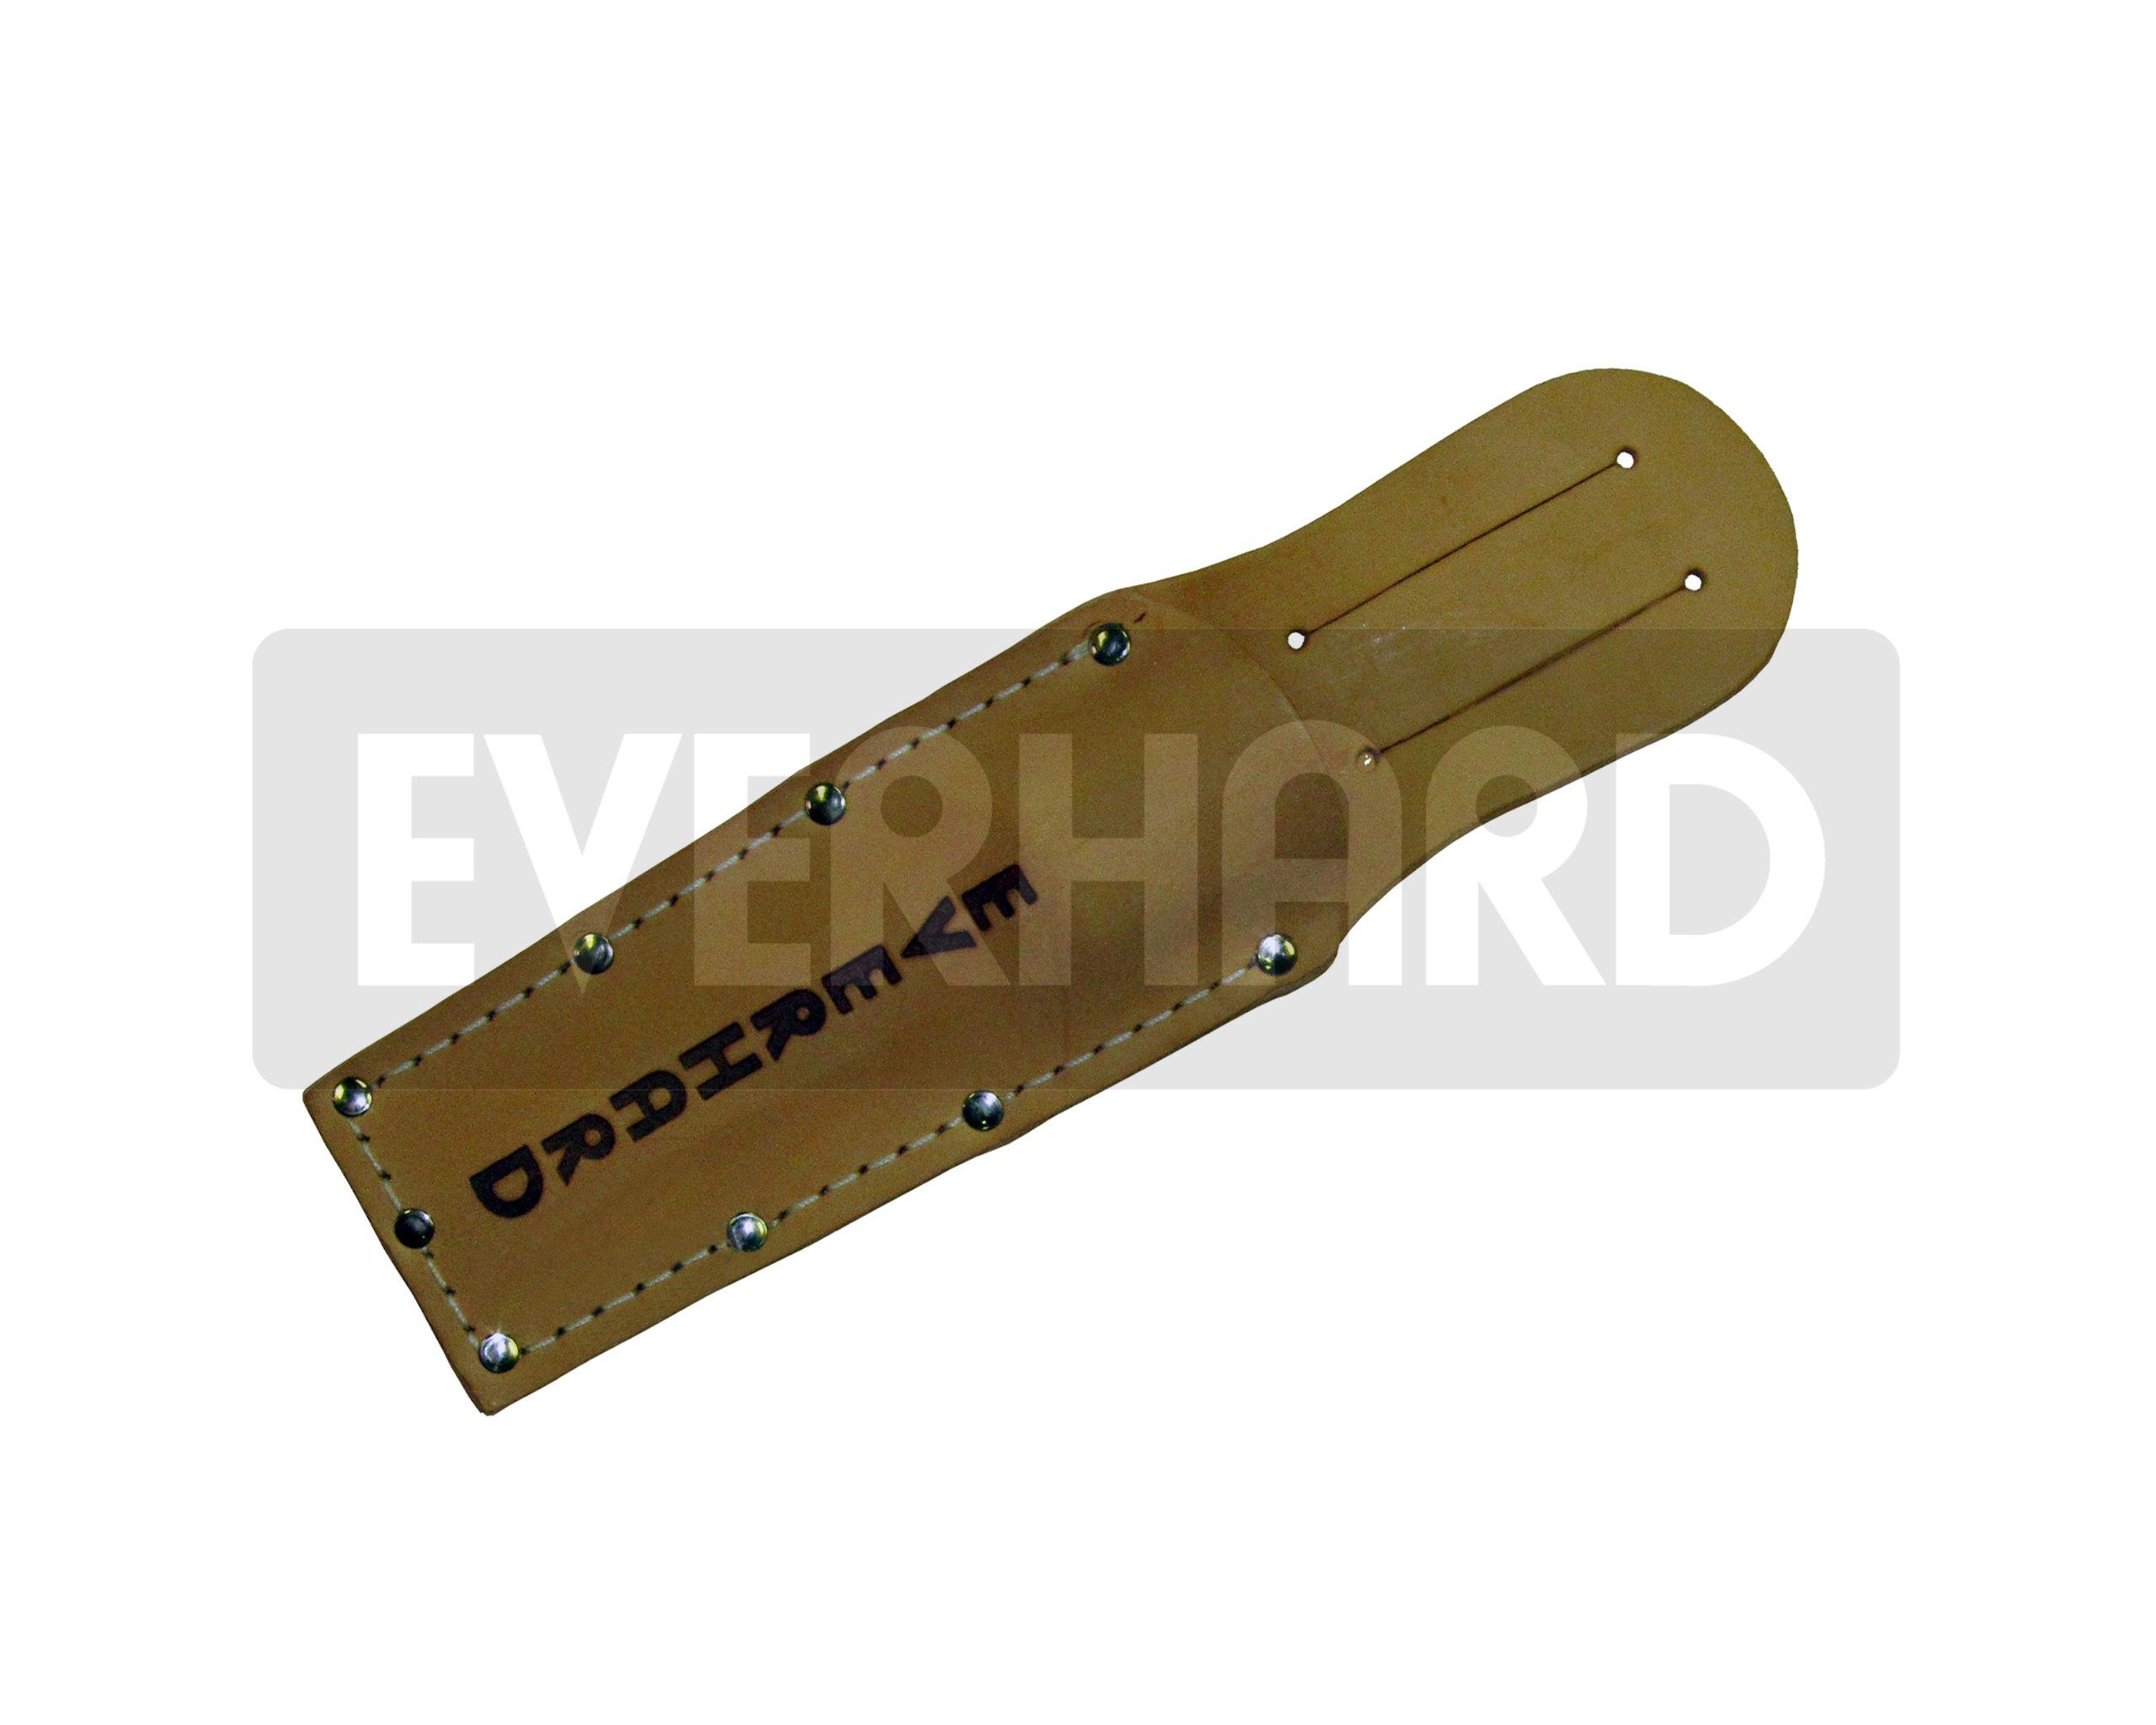 DM90070 Sheath for Everhard Long Cut® Insulation Knife